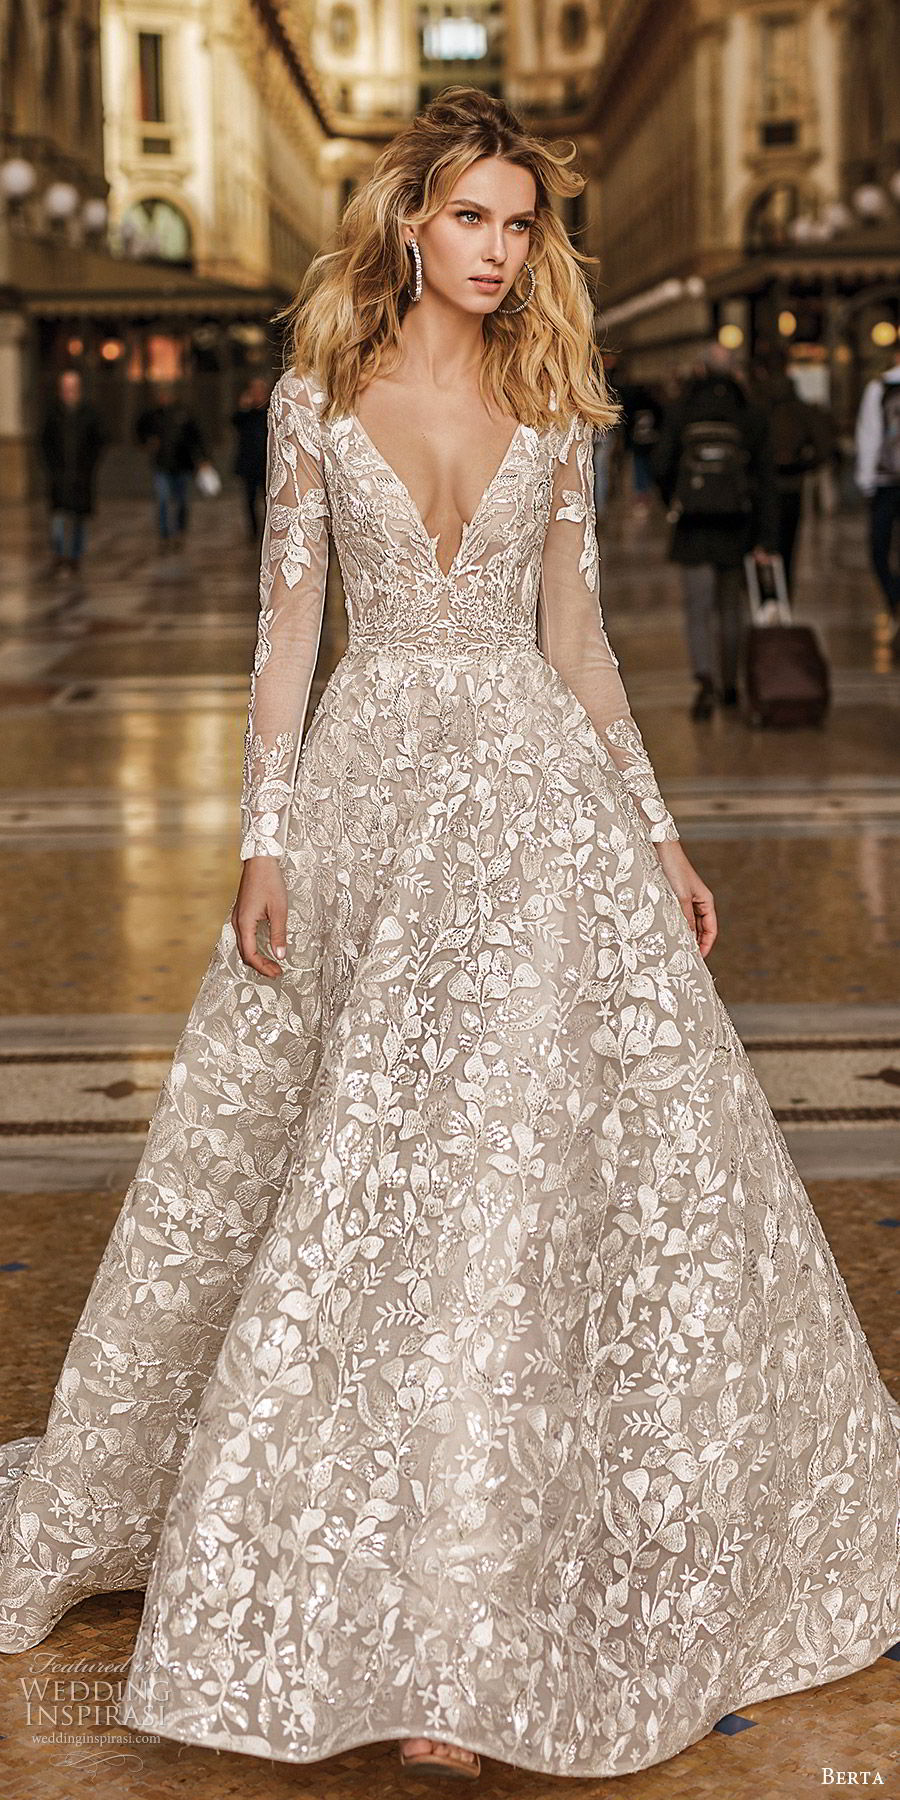 berta spring 2020 bridal illusion long sleeves deep v neck fully embellished a line ball gown wedding dress (11) romantic elegant chapel train mv